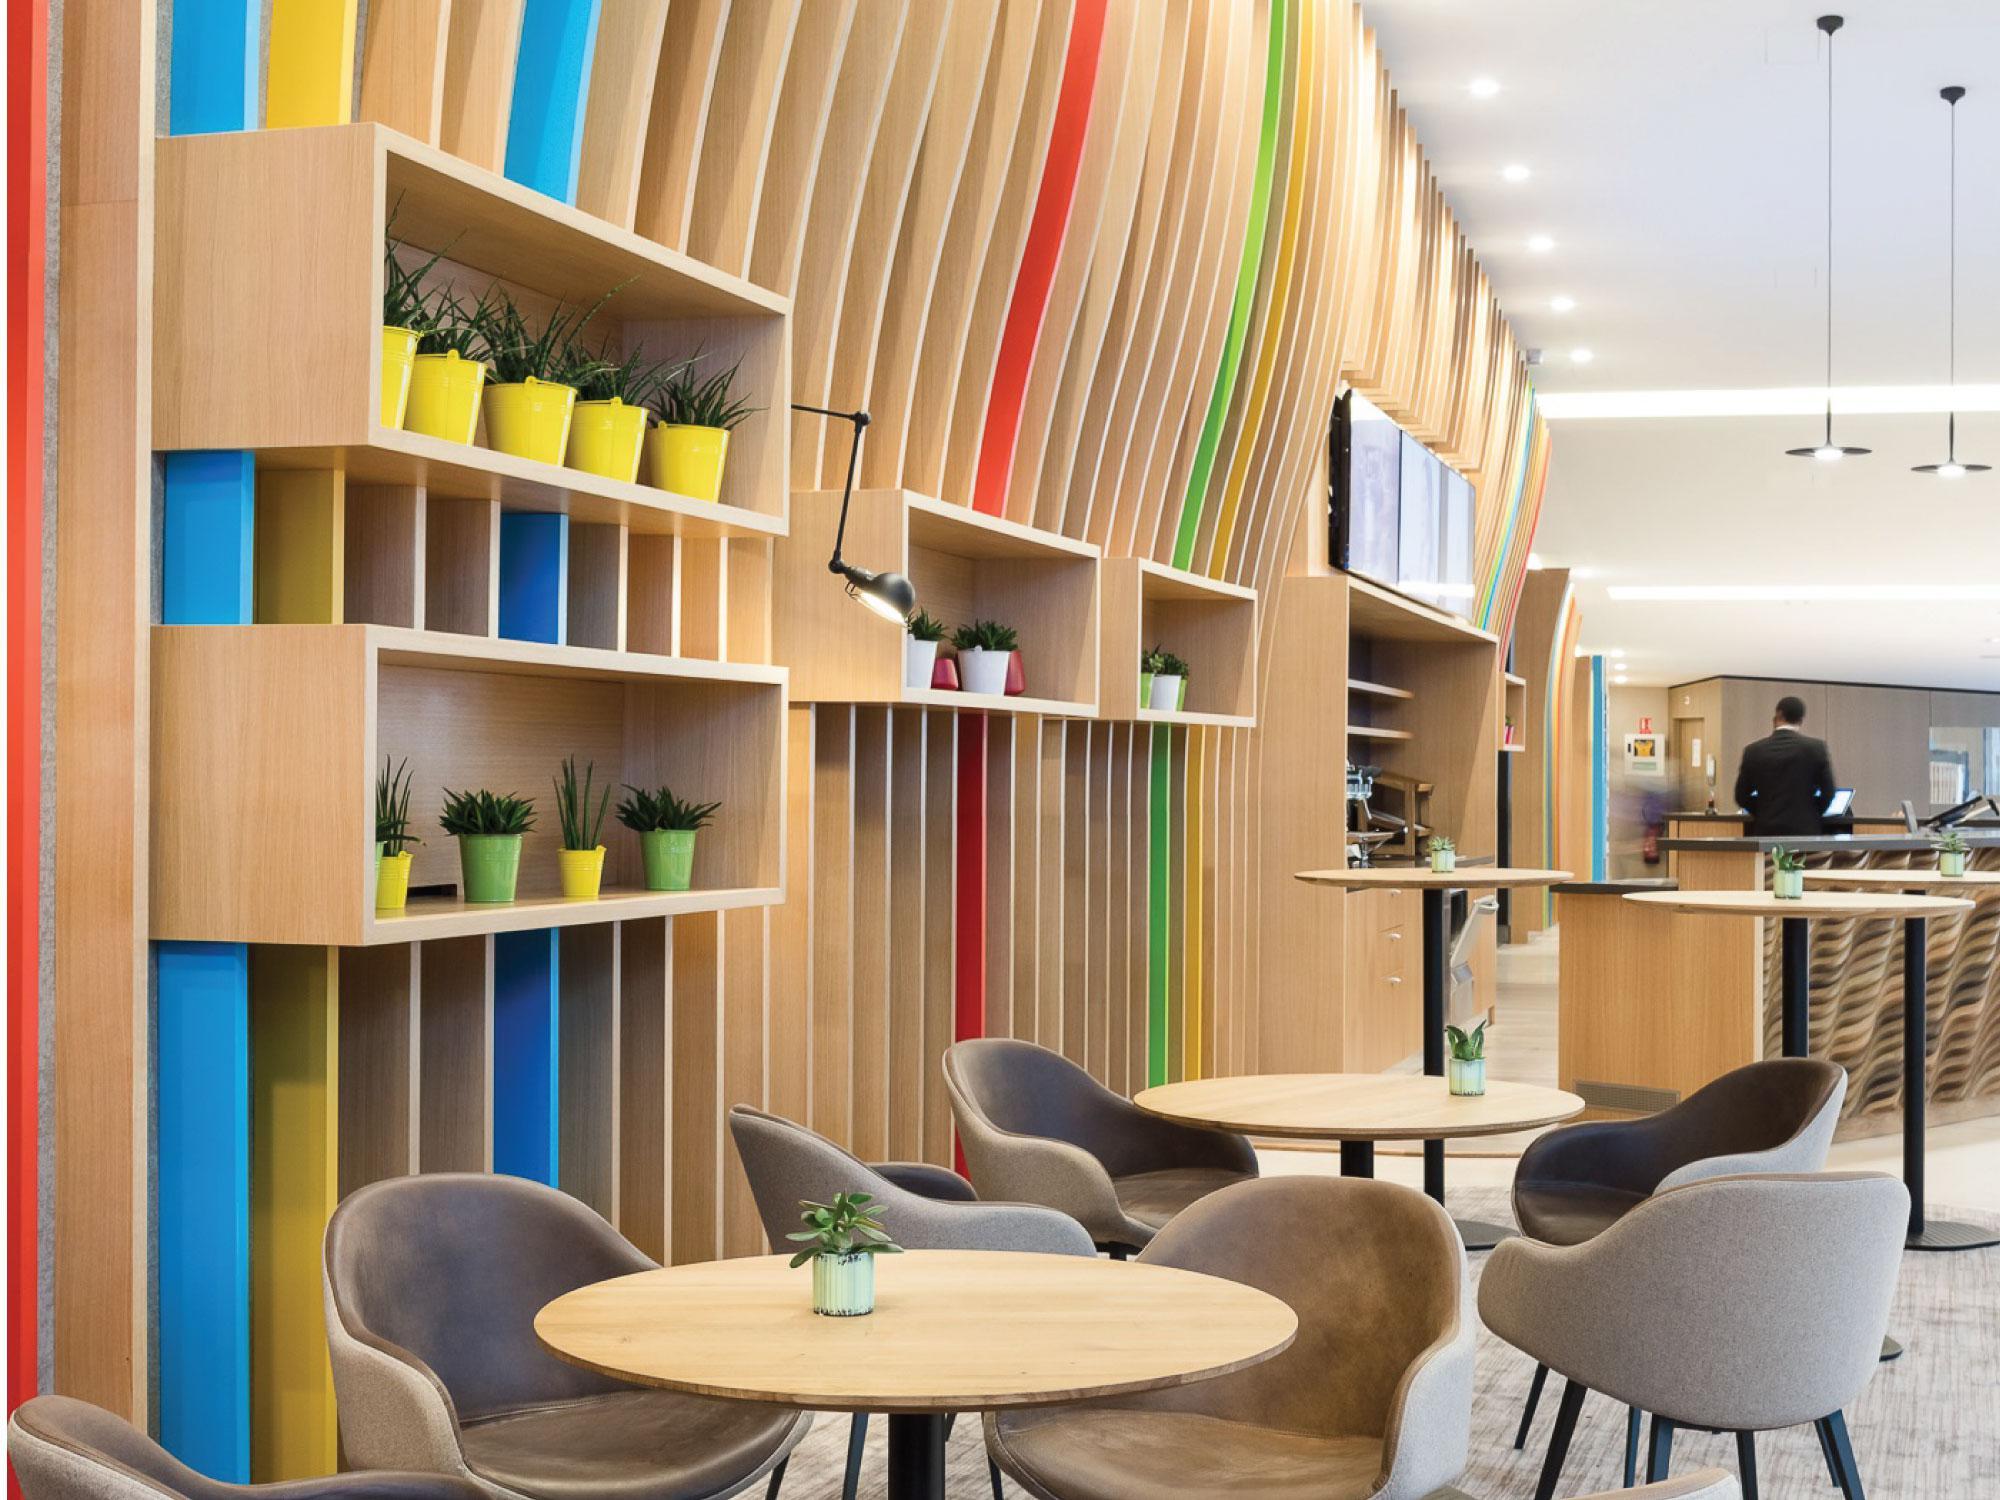 Oberflex paneler i lys eik og lønn på hyller og møbler hos Microsoft France Paris.